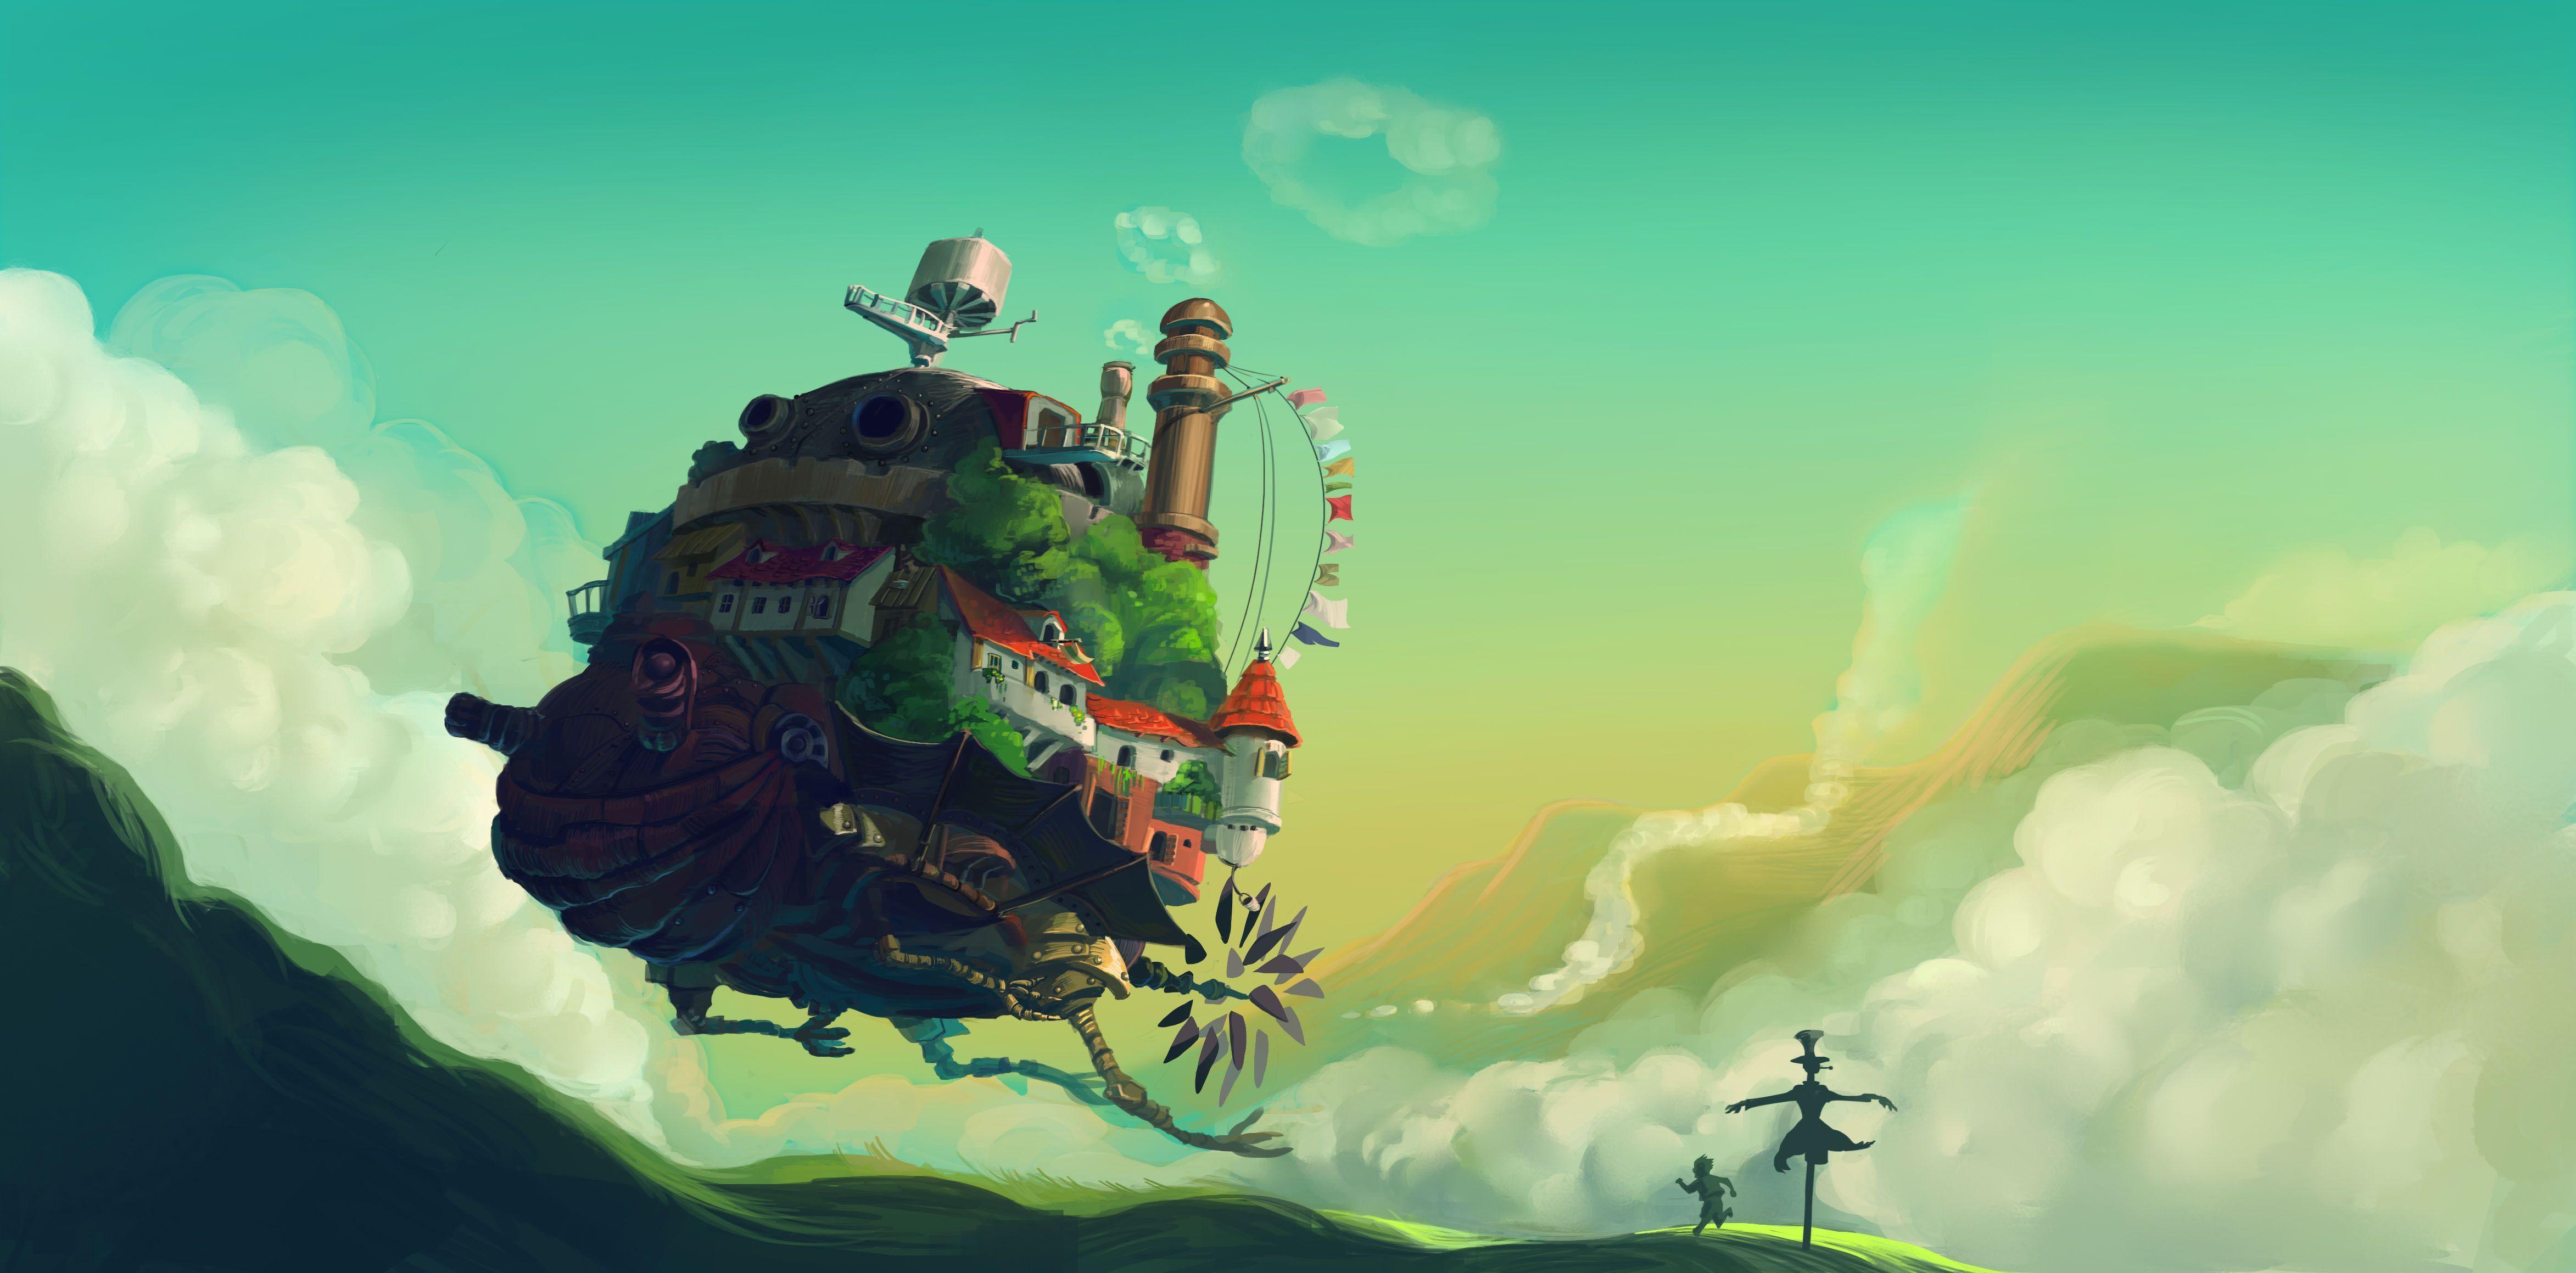 Download Wallpaper Howl Moving Castle Hayao Miyazaki Hills